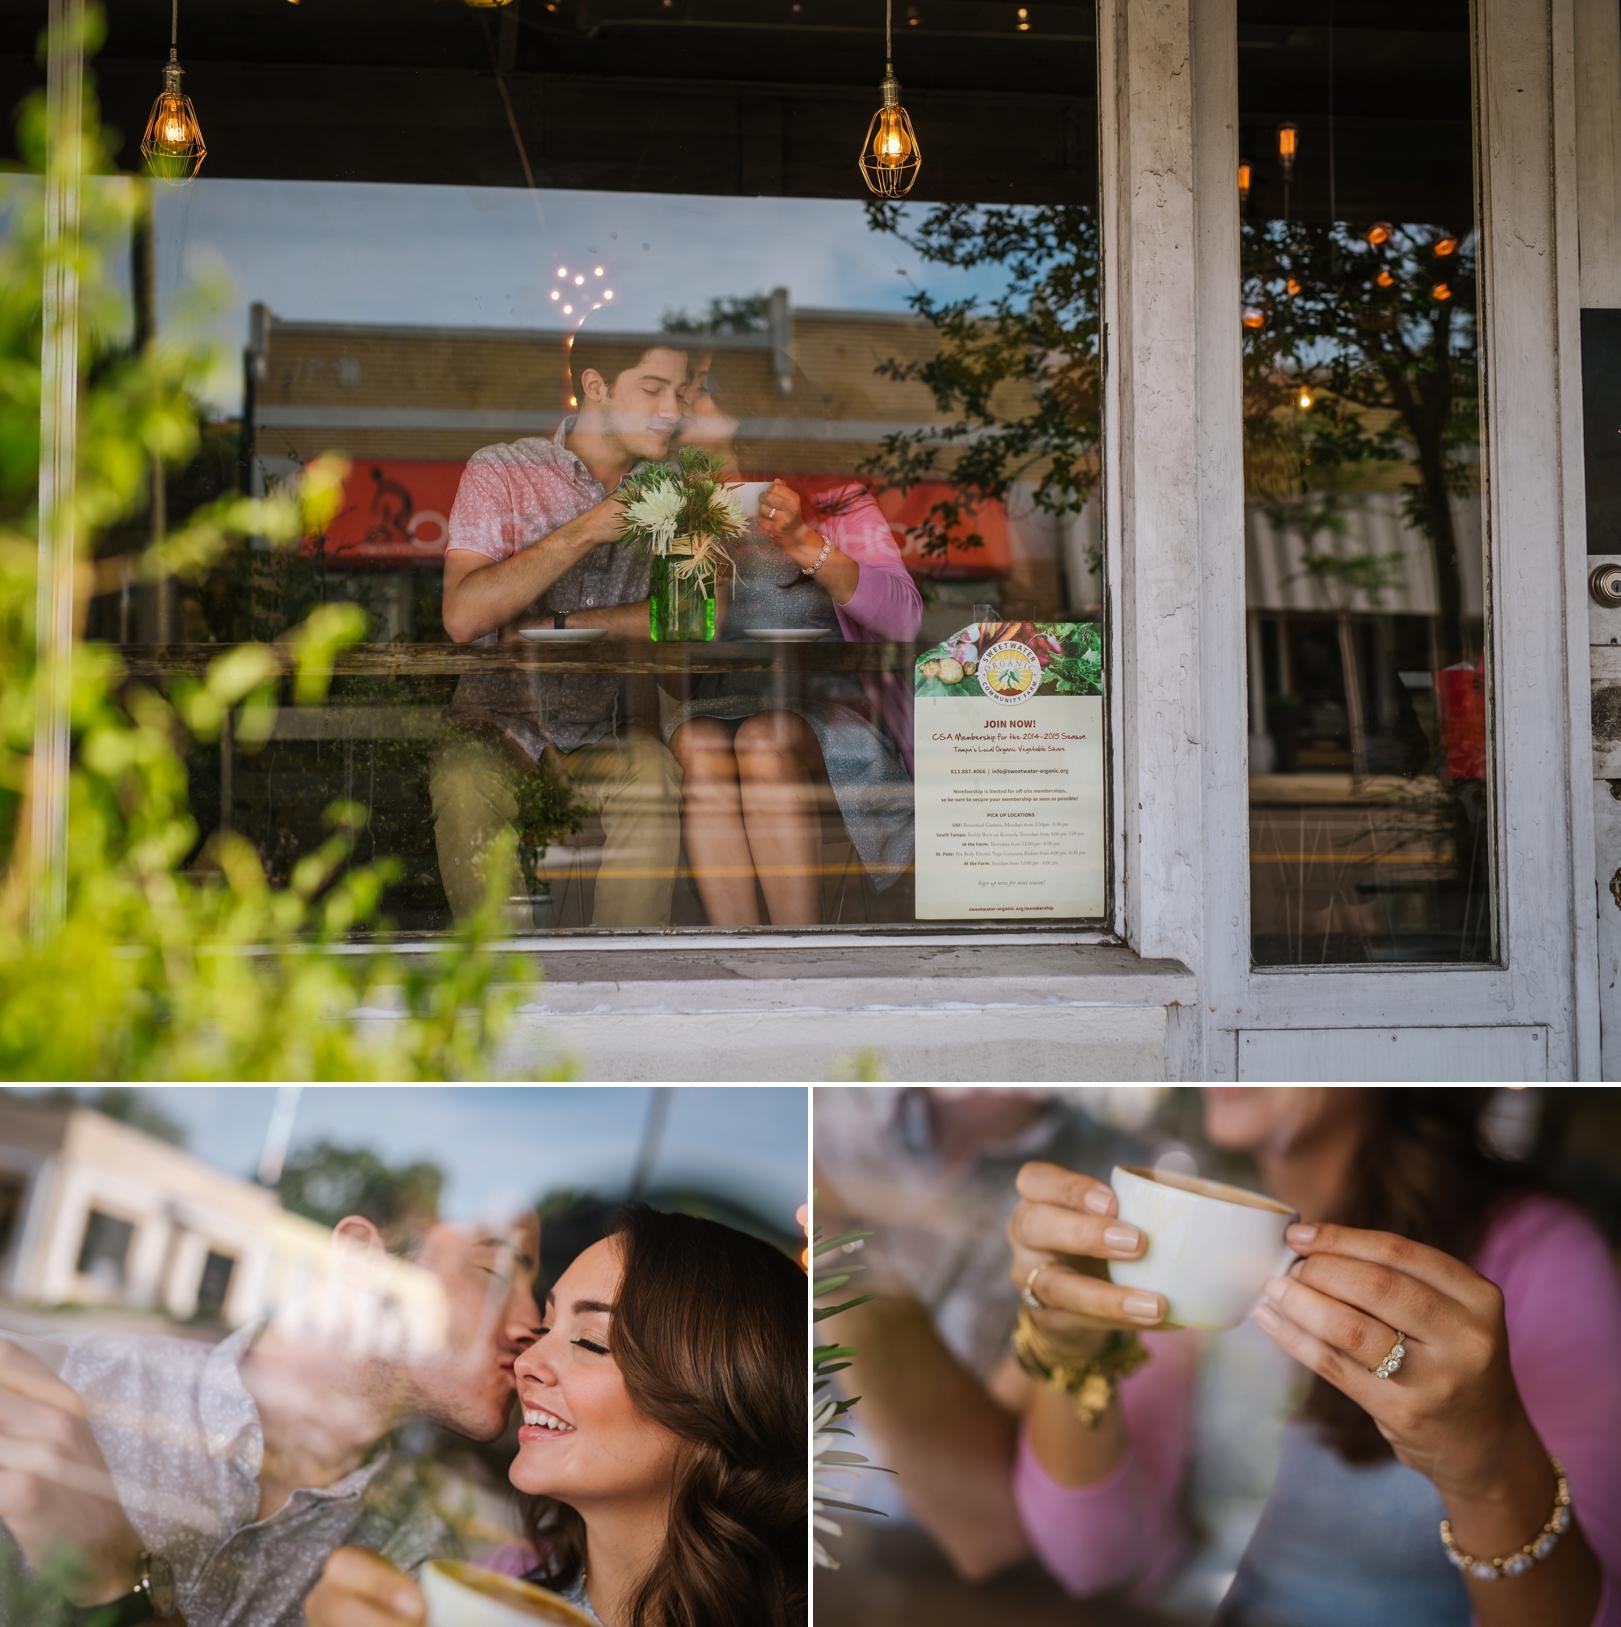 ashlee-hamon-photography-tampa-buddy-brew-coffee-shop-engagement_0001.jpg